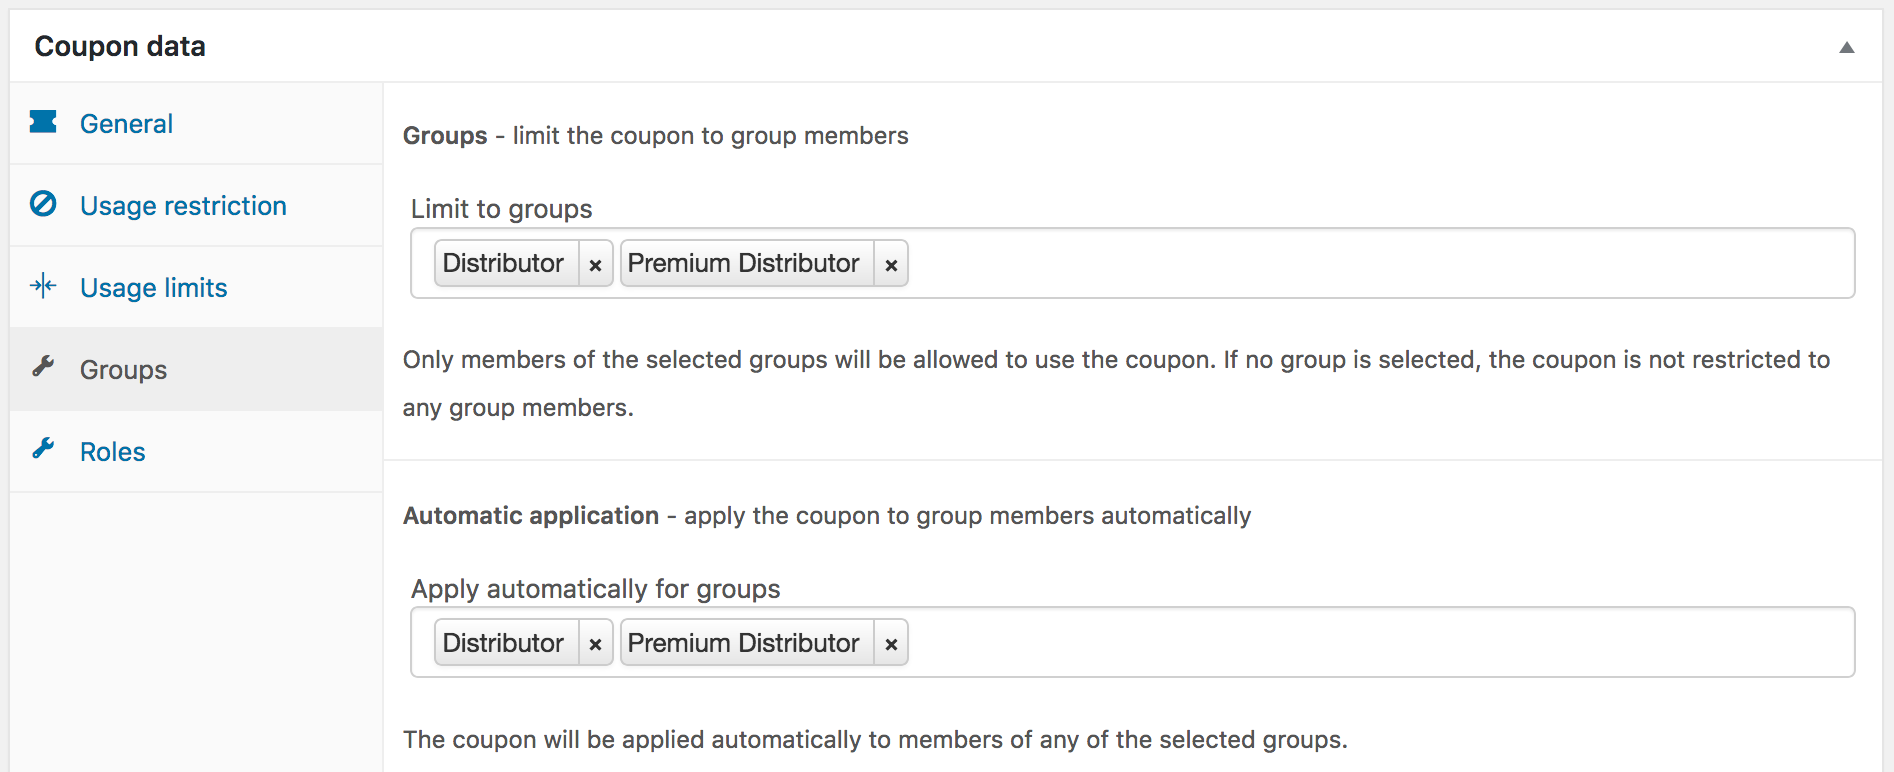 Showing coupon settings for distributor groups